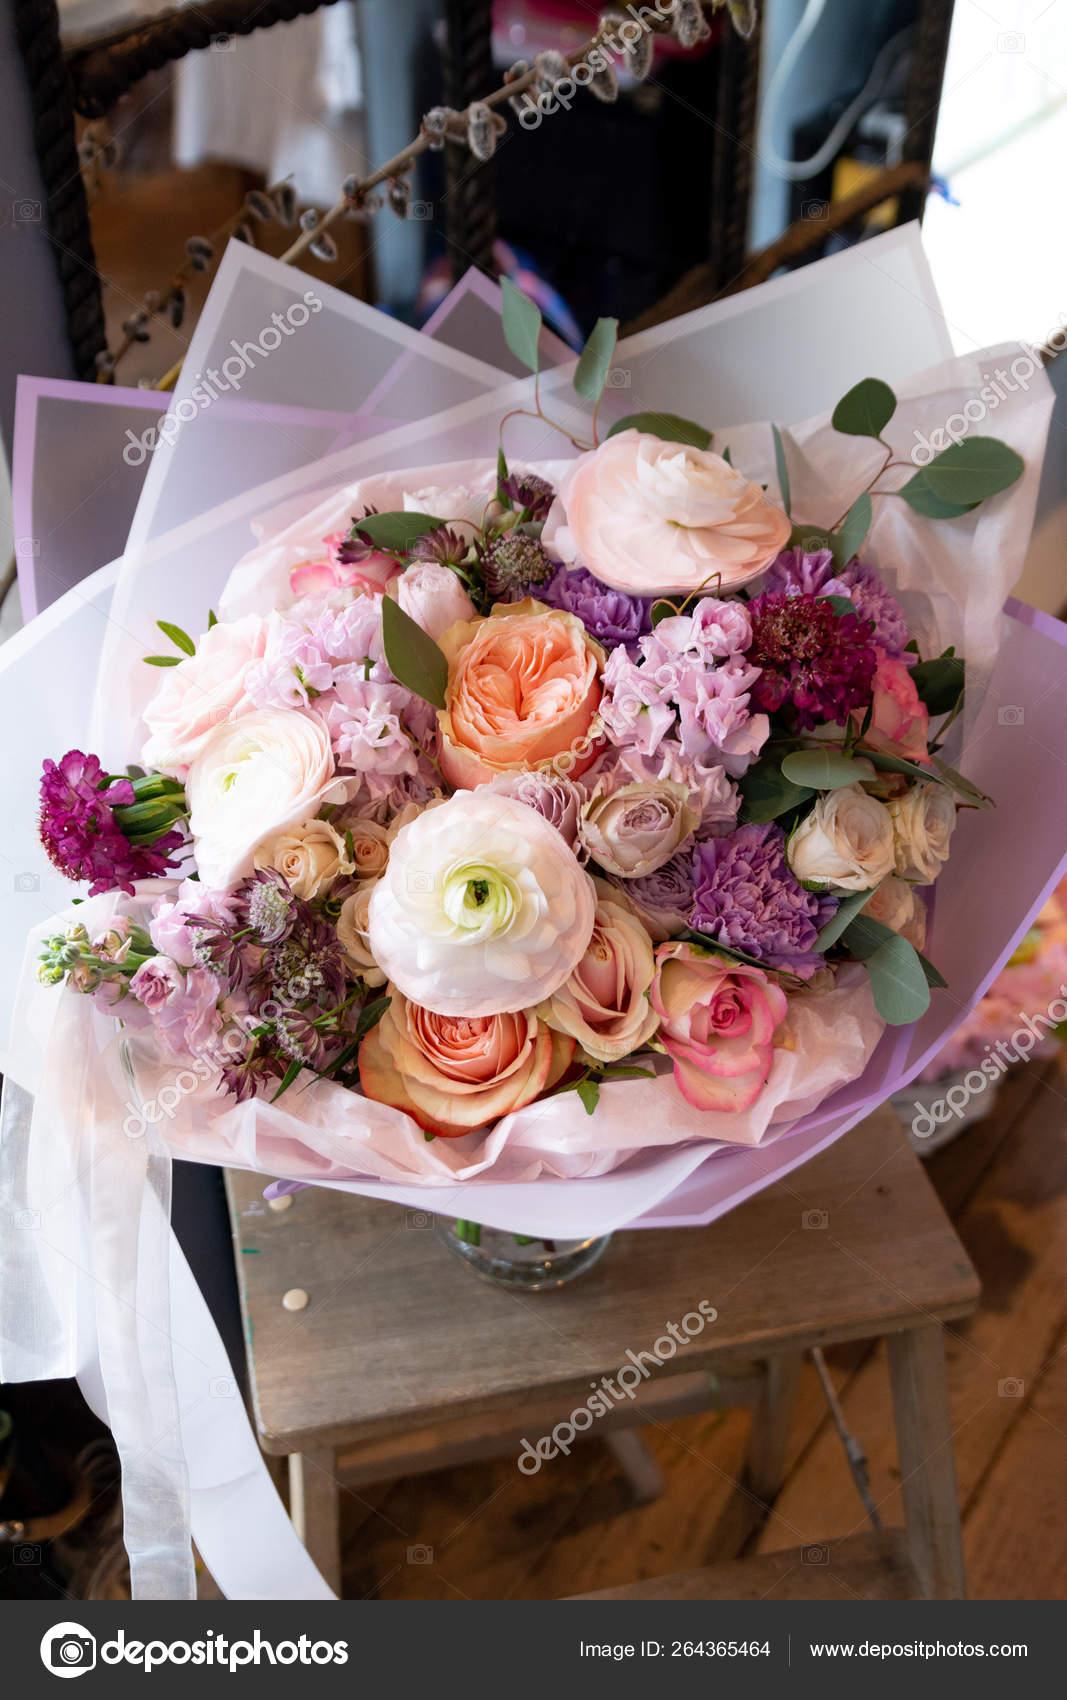 Bouquet Flowers Wedding Salon Roses Anemone Tulip Ranunculus Sunflower Garden Stock Photo Image By C Plan905 264365464